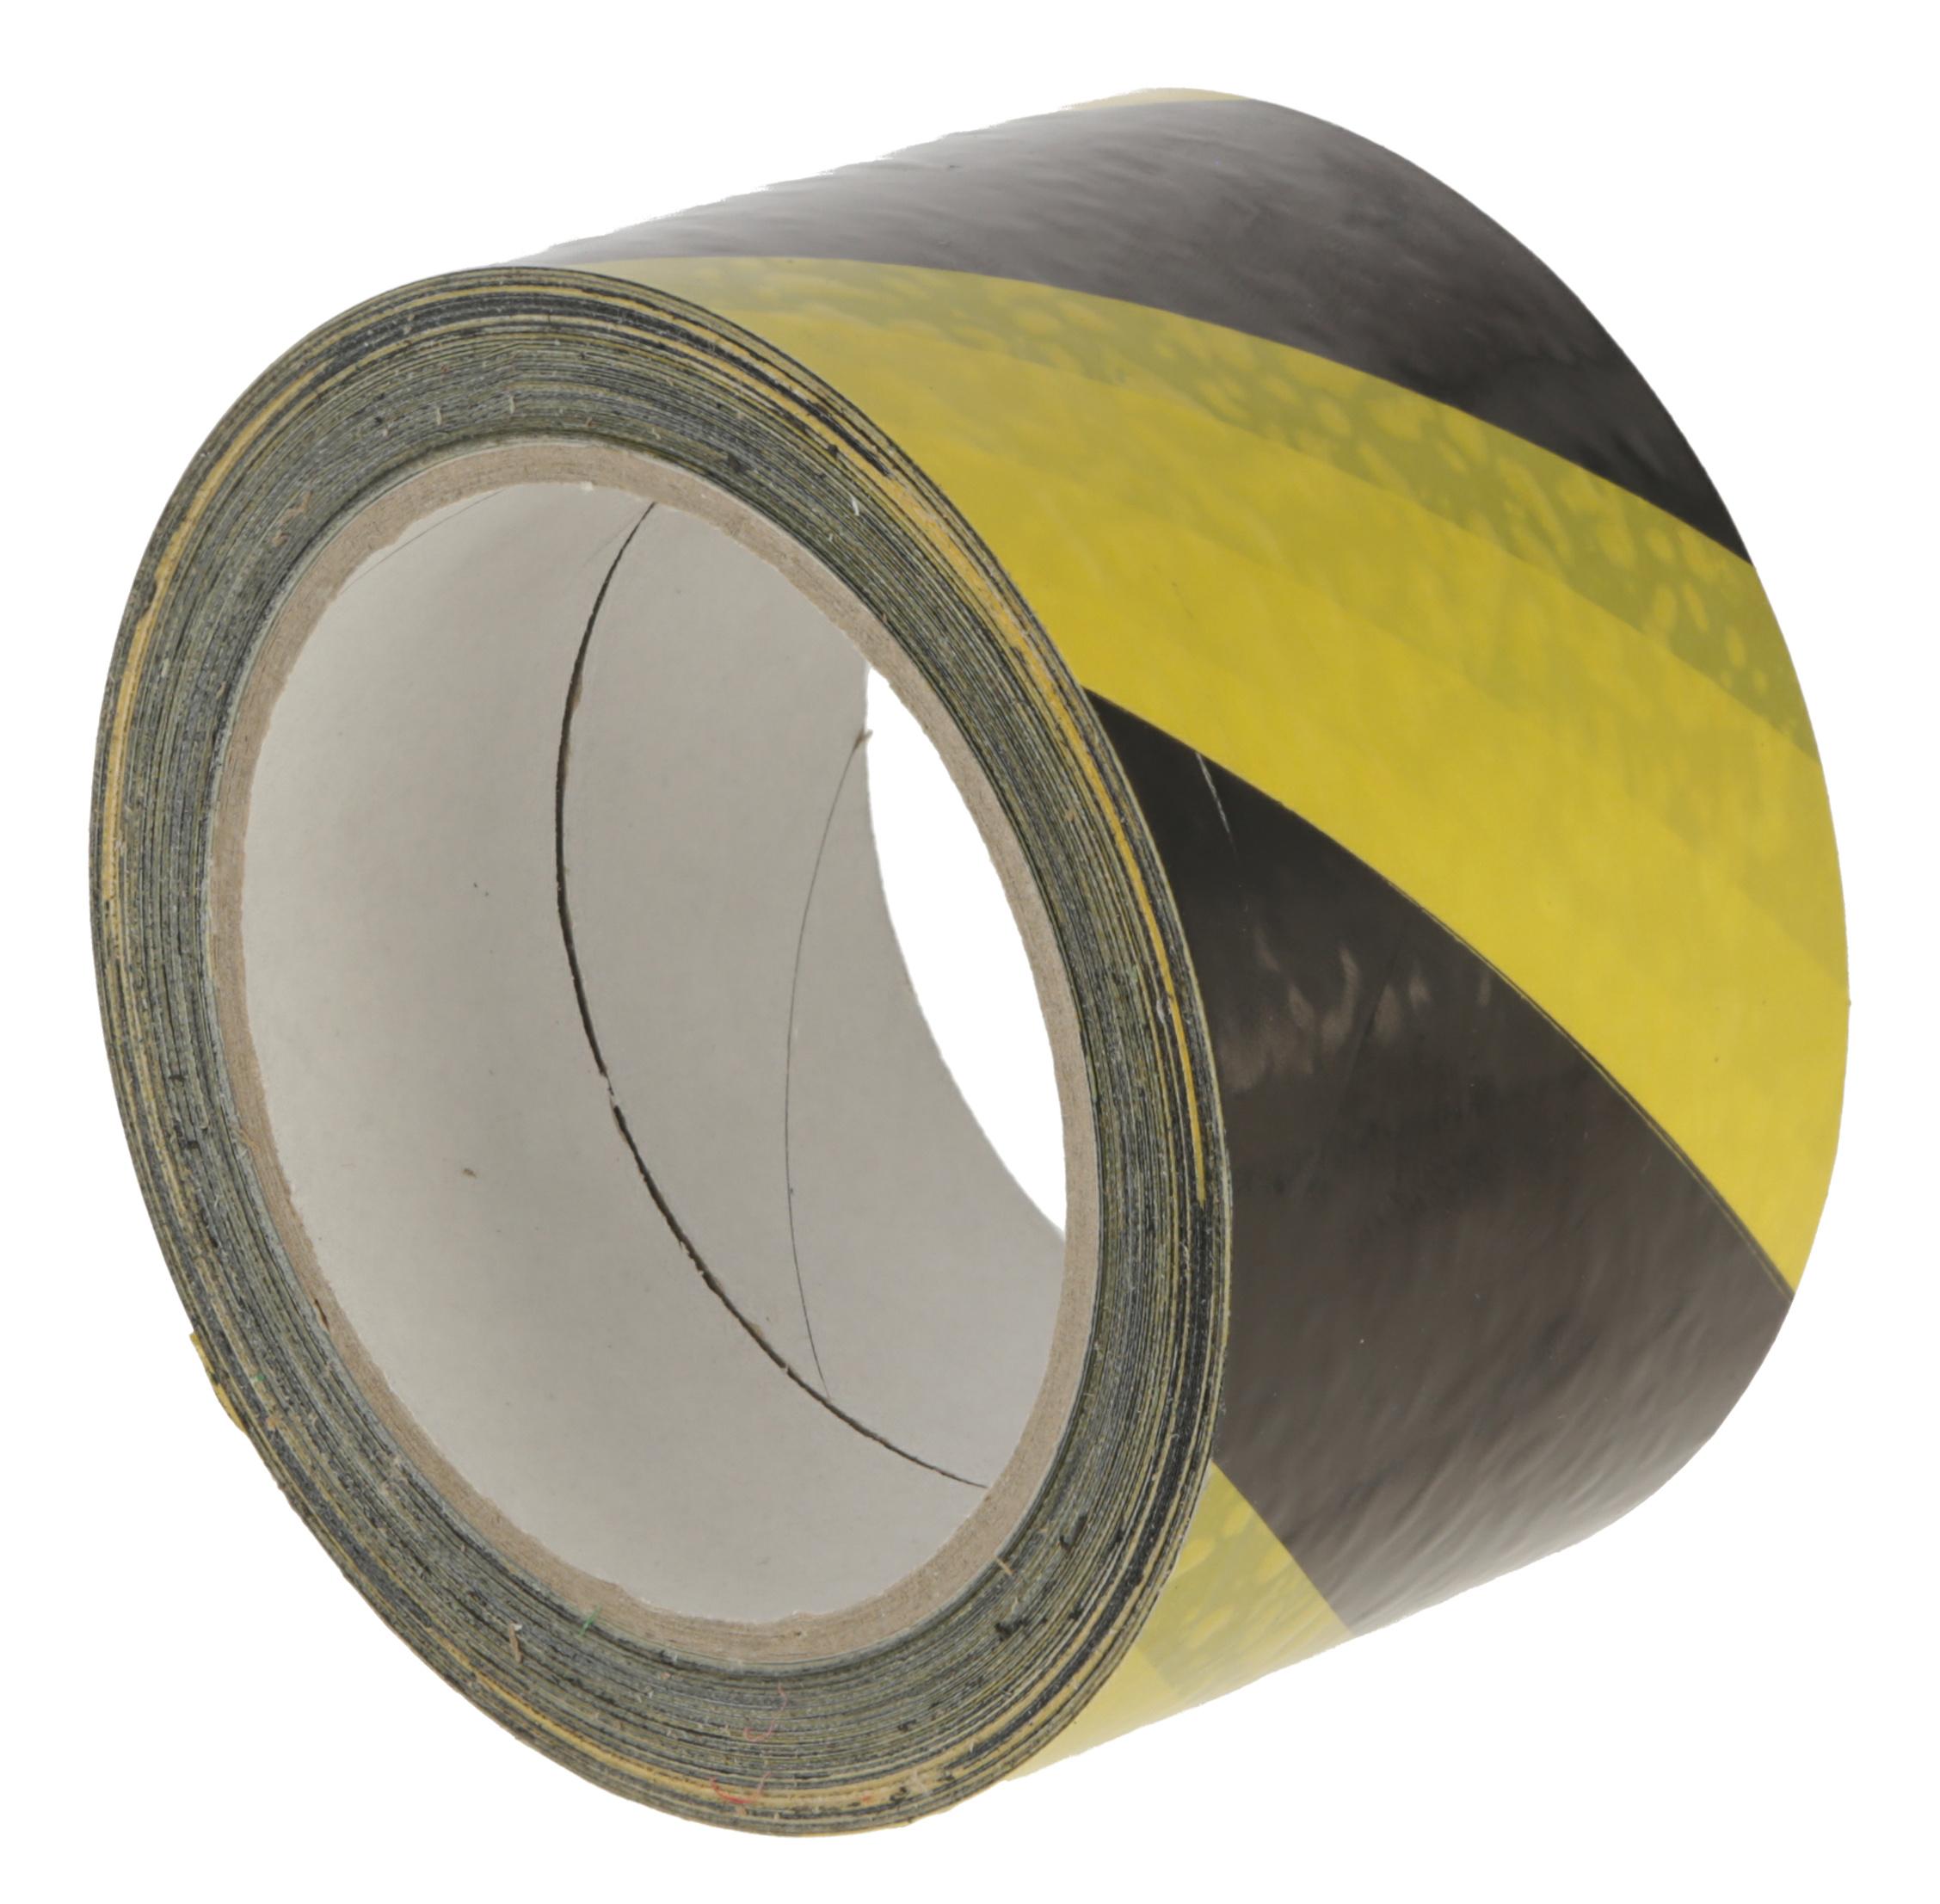 Warnband selbstklebend gelb-schwarz, 66mx60mm